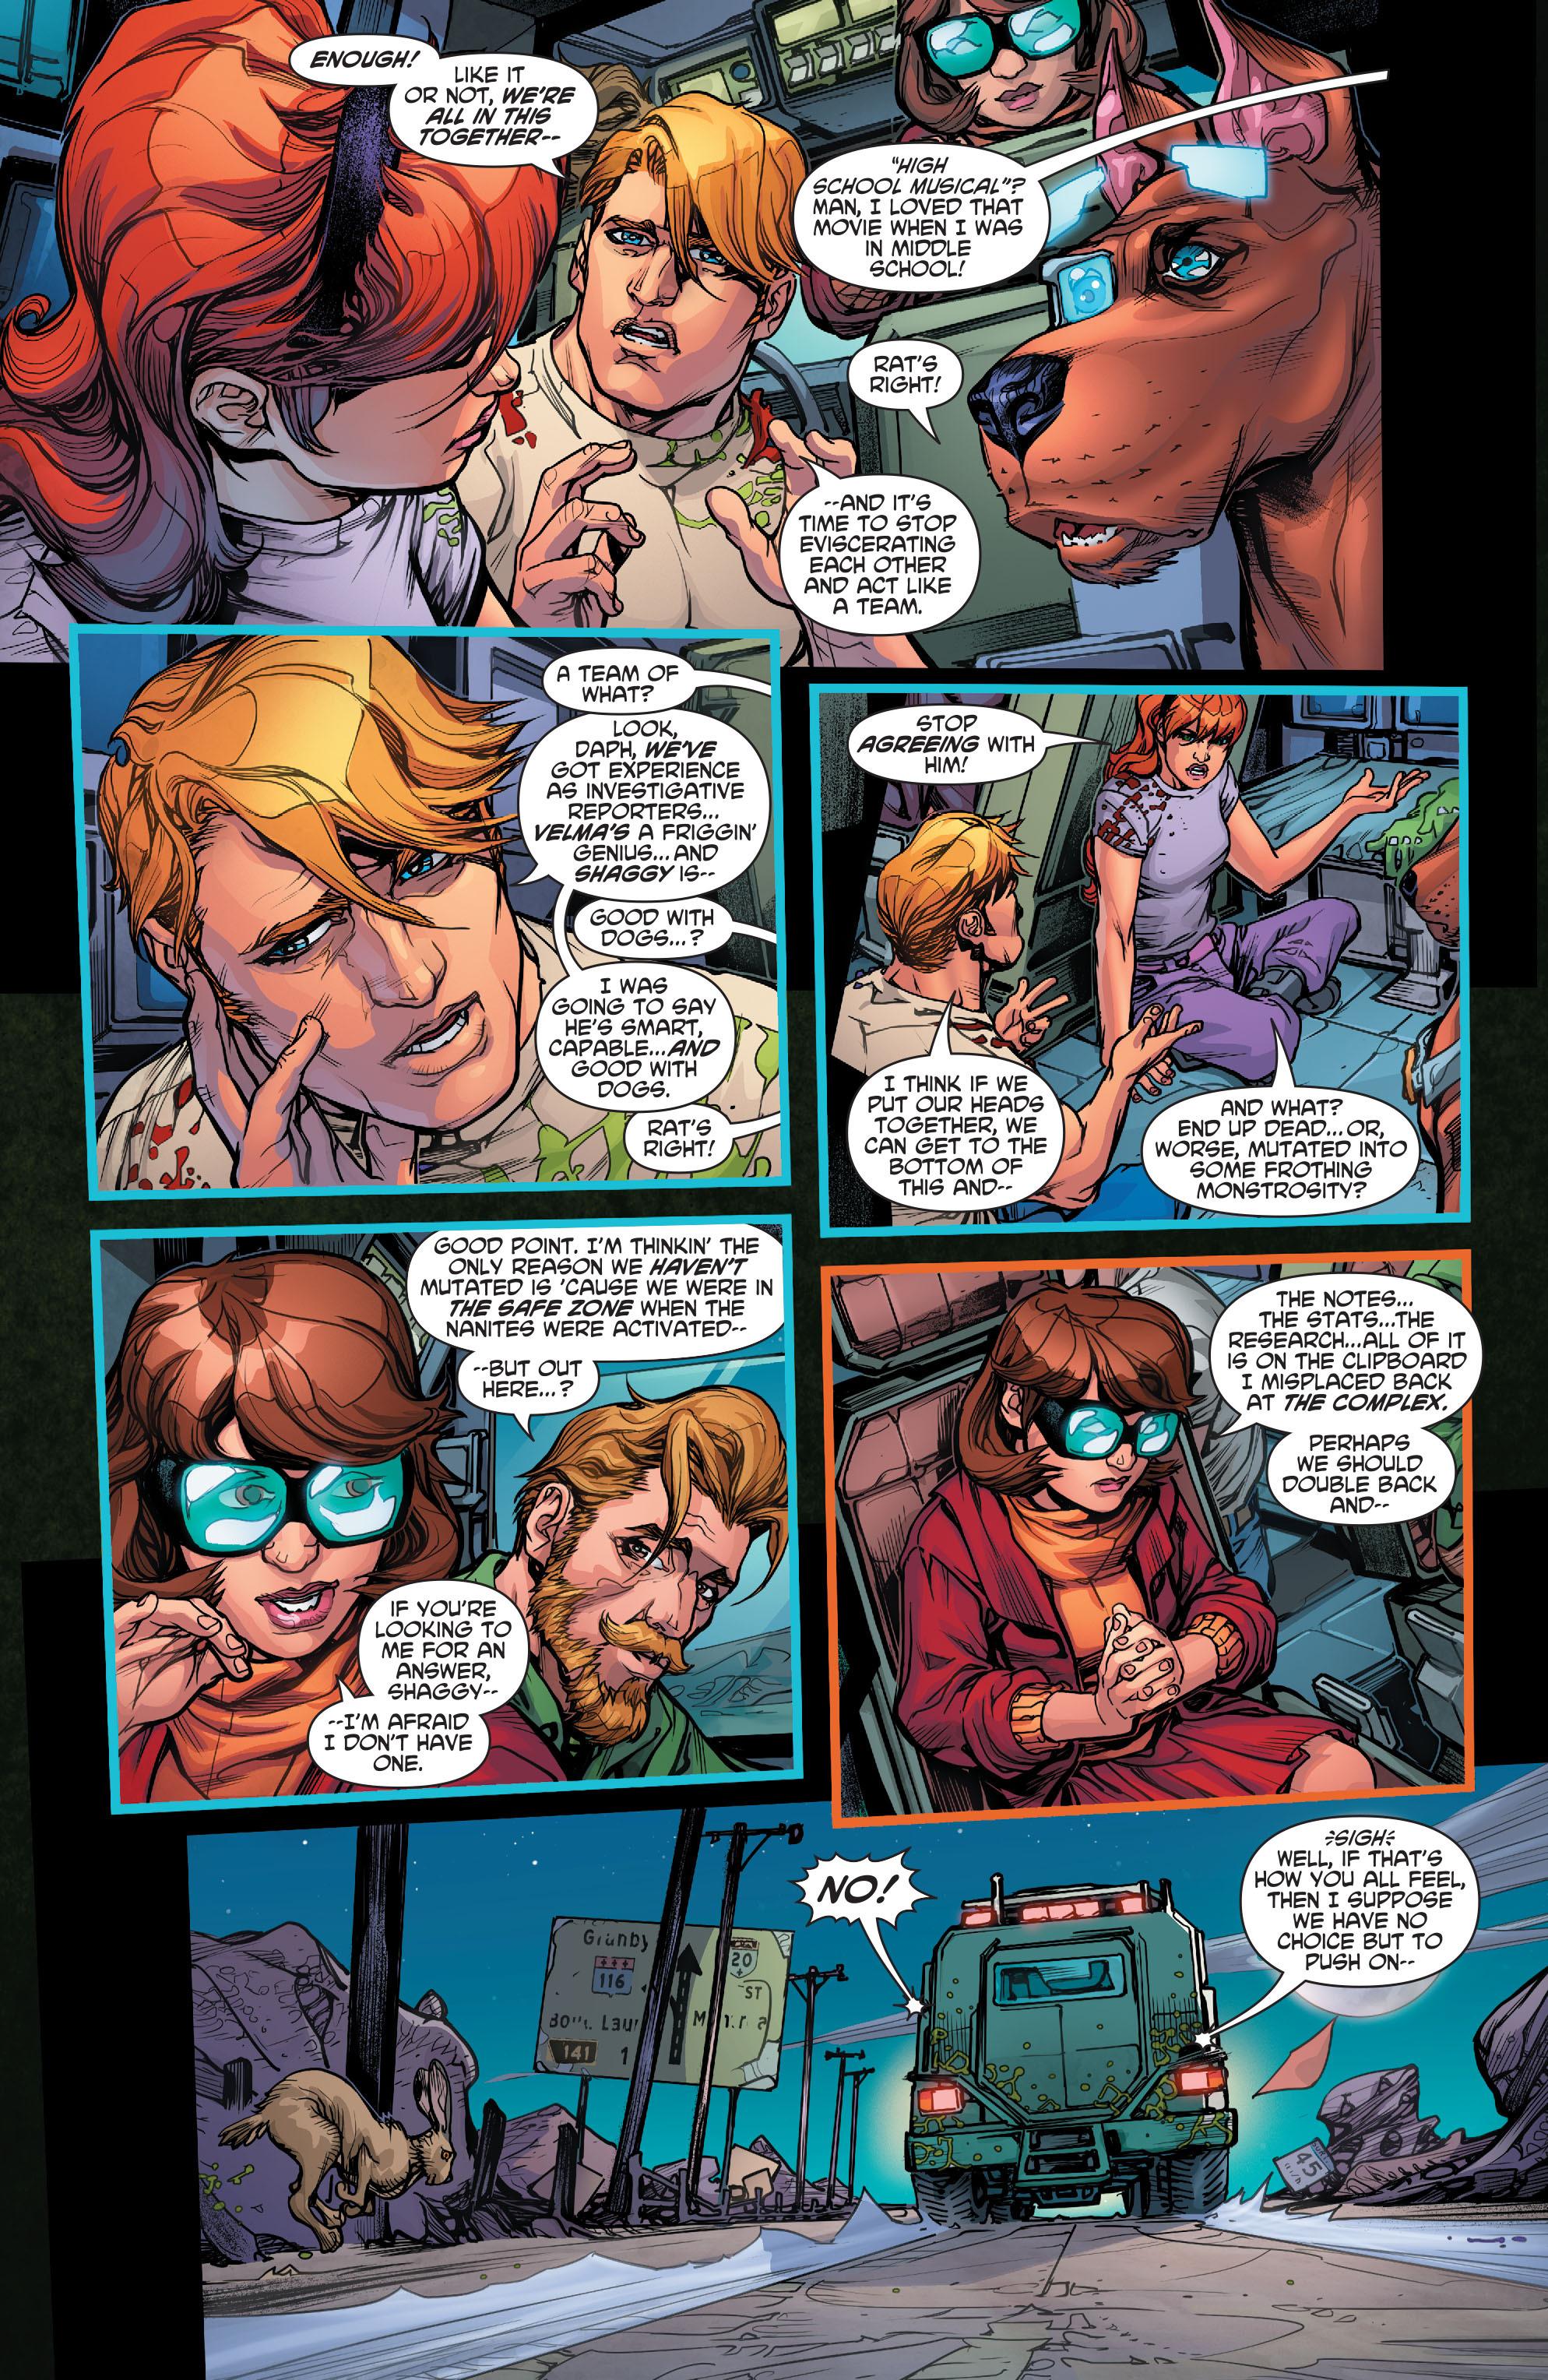 Read online Scooby Apocalypse comic -  Issue #4 - 16